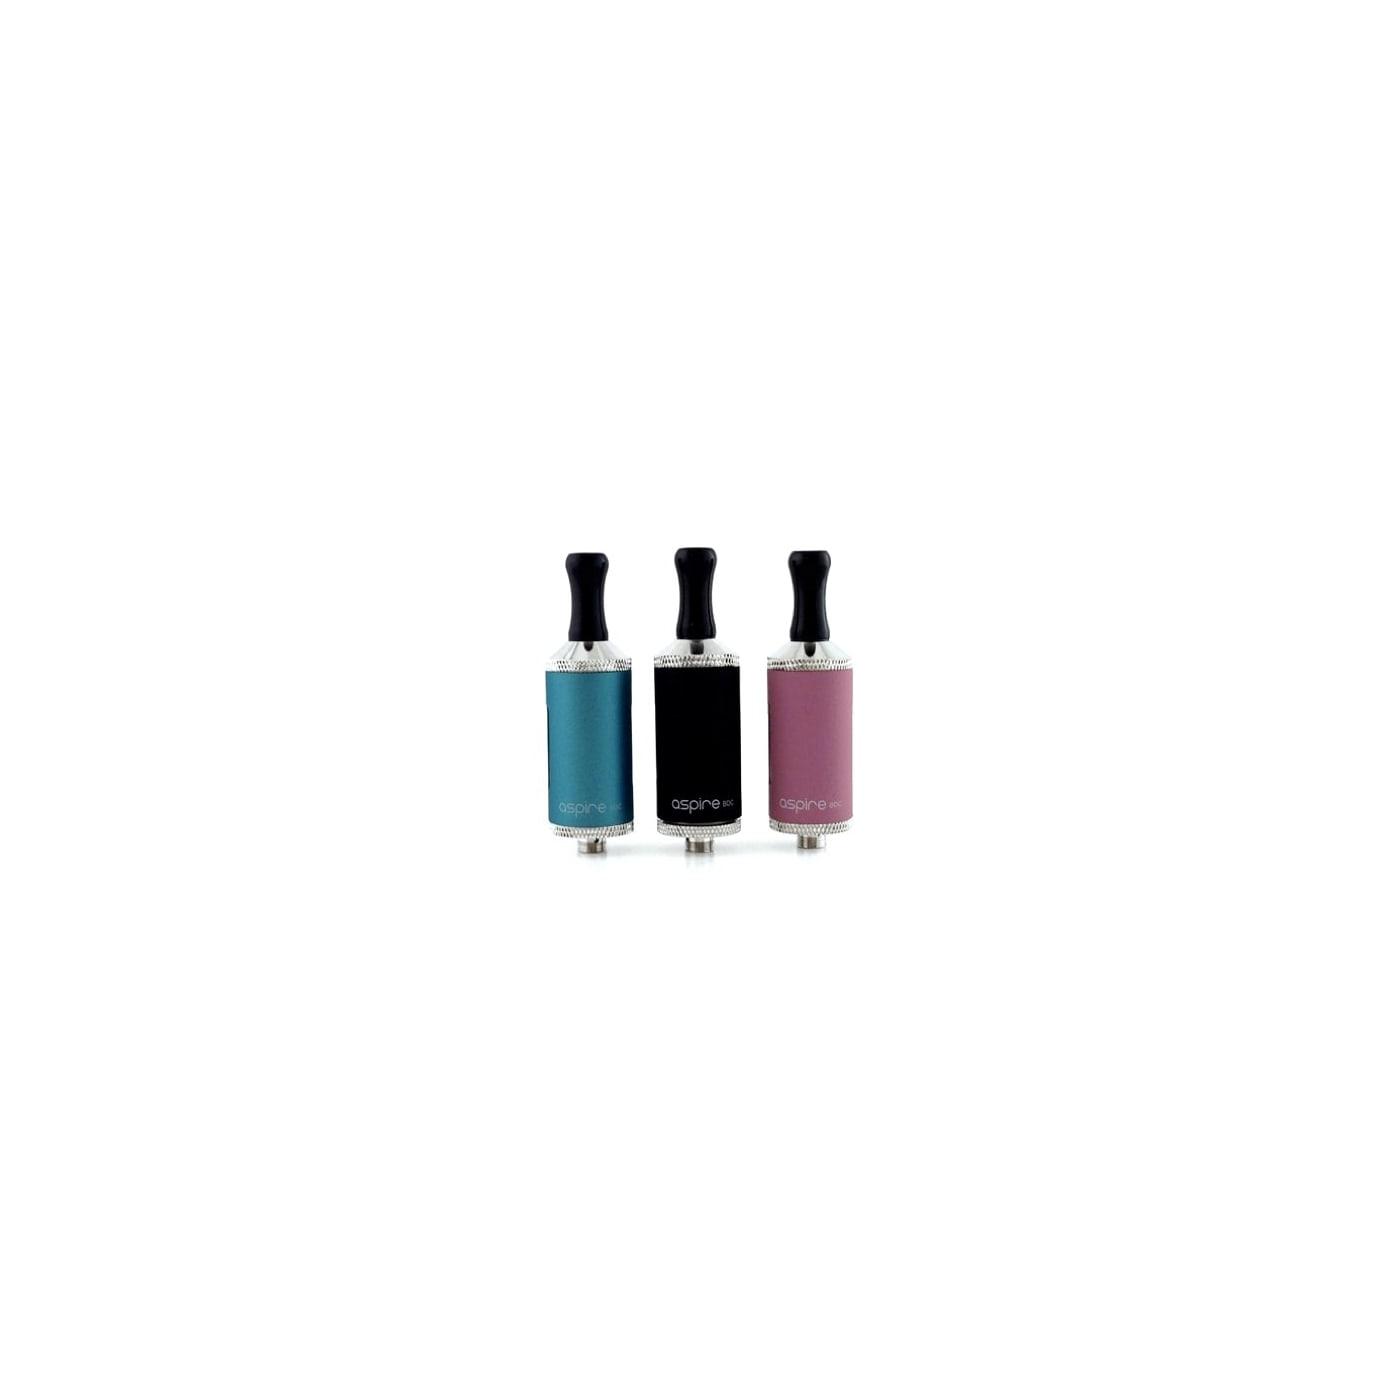 Aspire Viva Nova-S Glass Version Clearomizer 1.8 ohm 3.5 ml